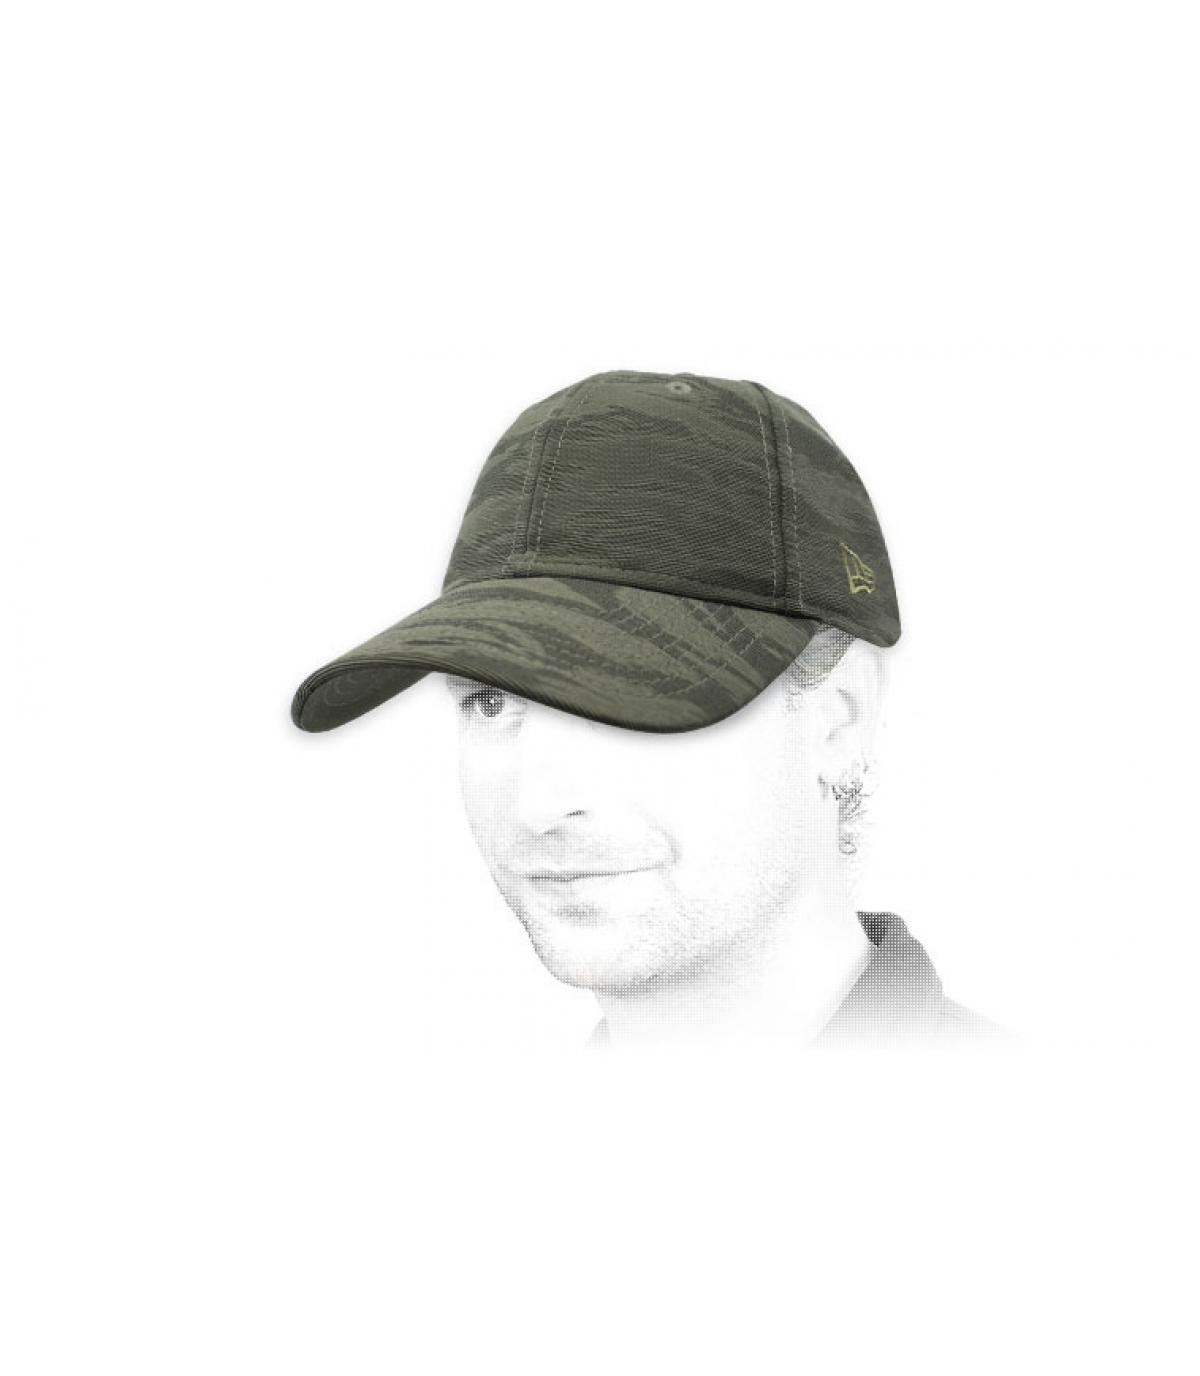 casquette New Era camo gris